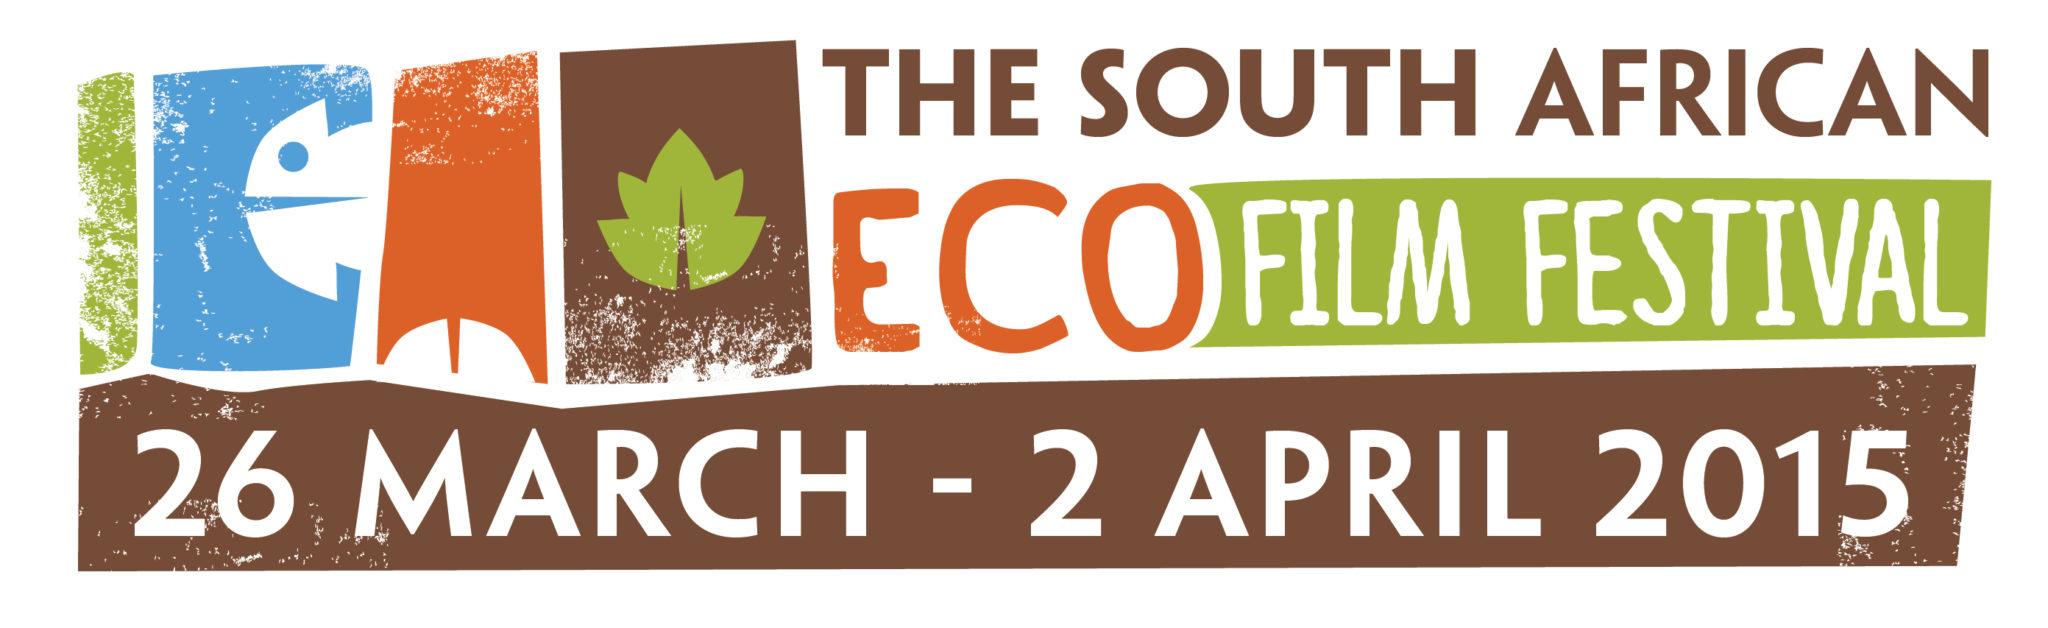 SA_eco_filmfestival-01